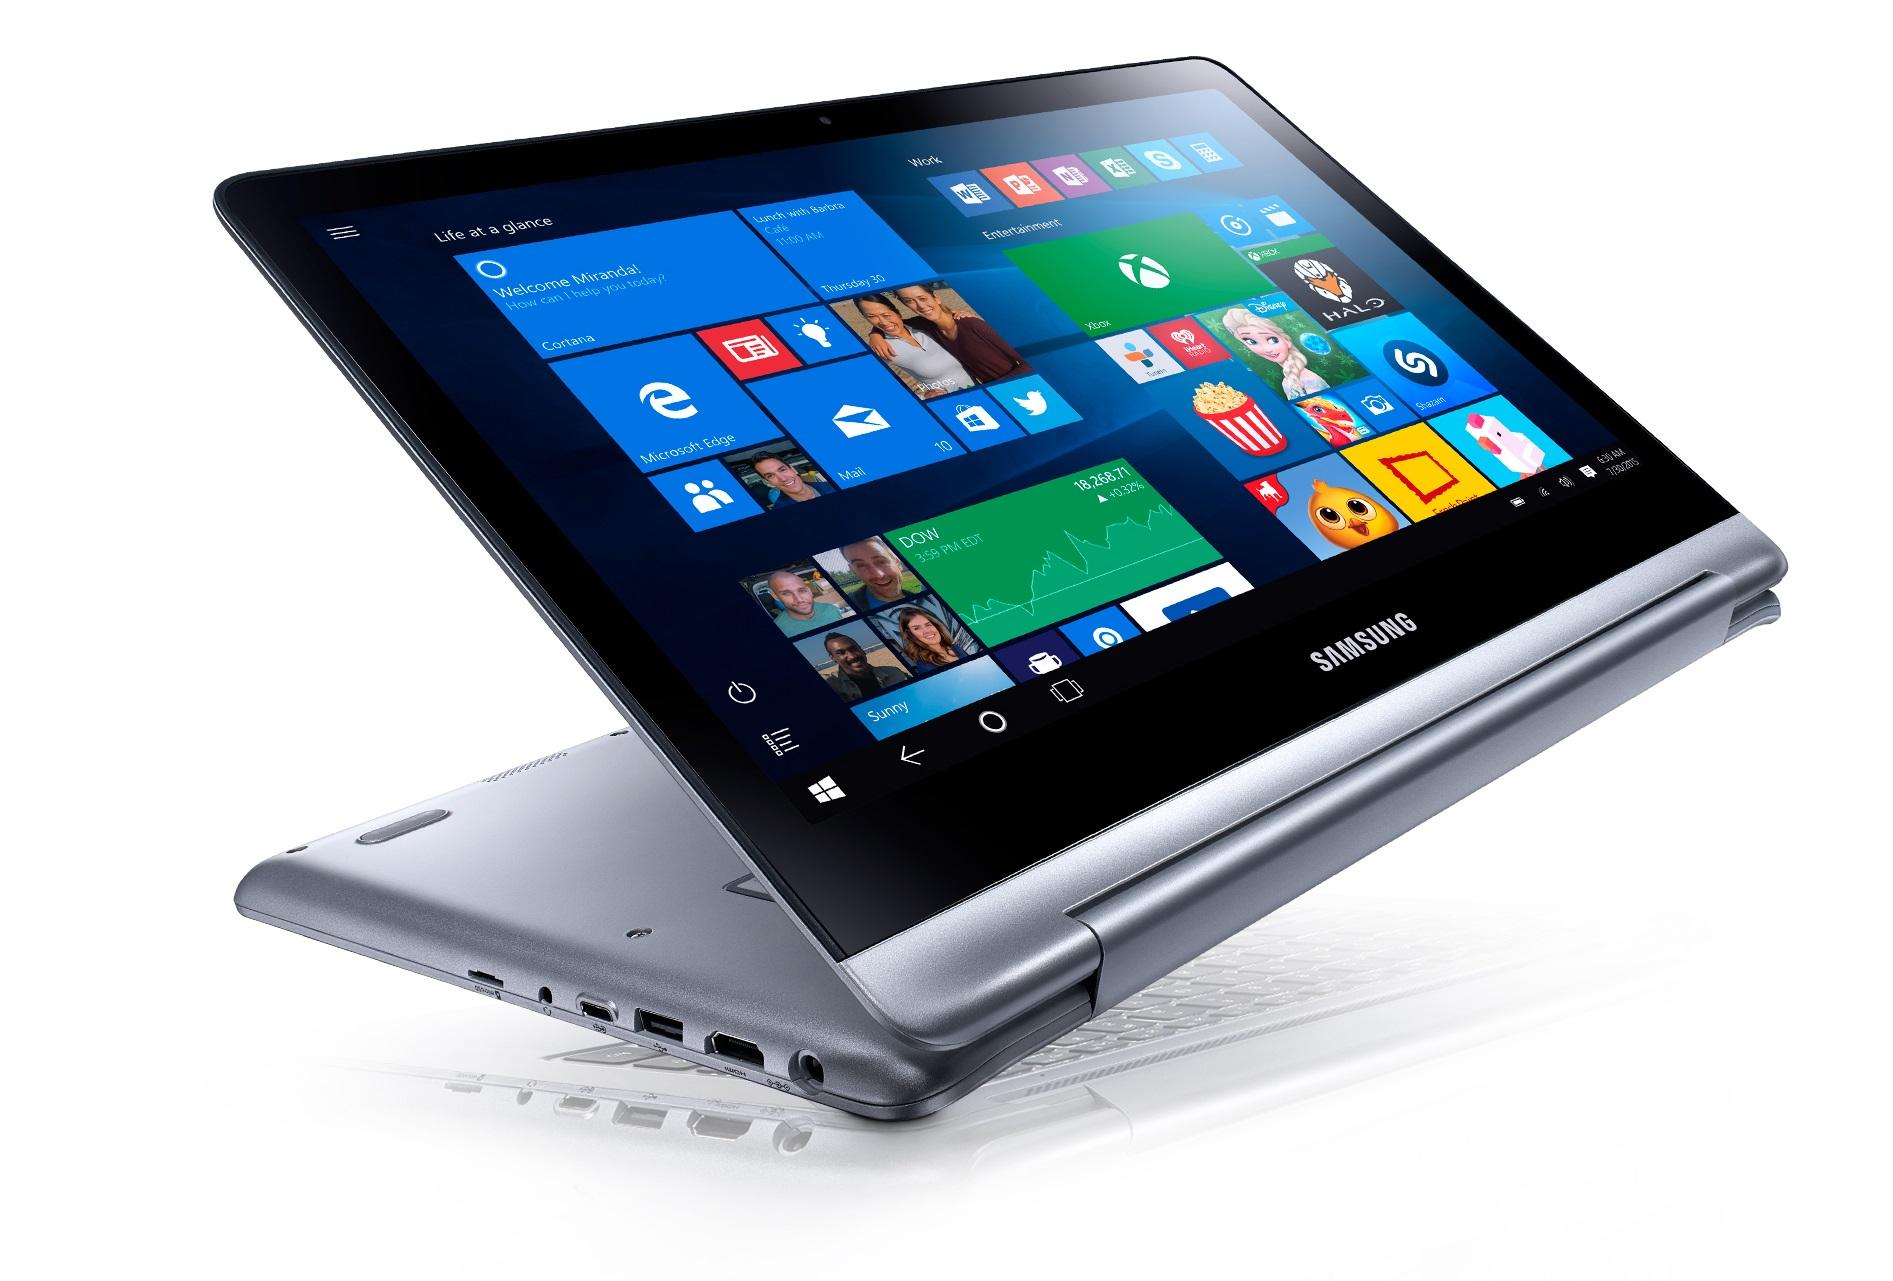 Best Laptop for $800